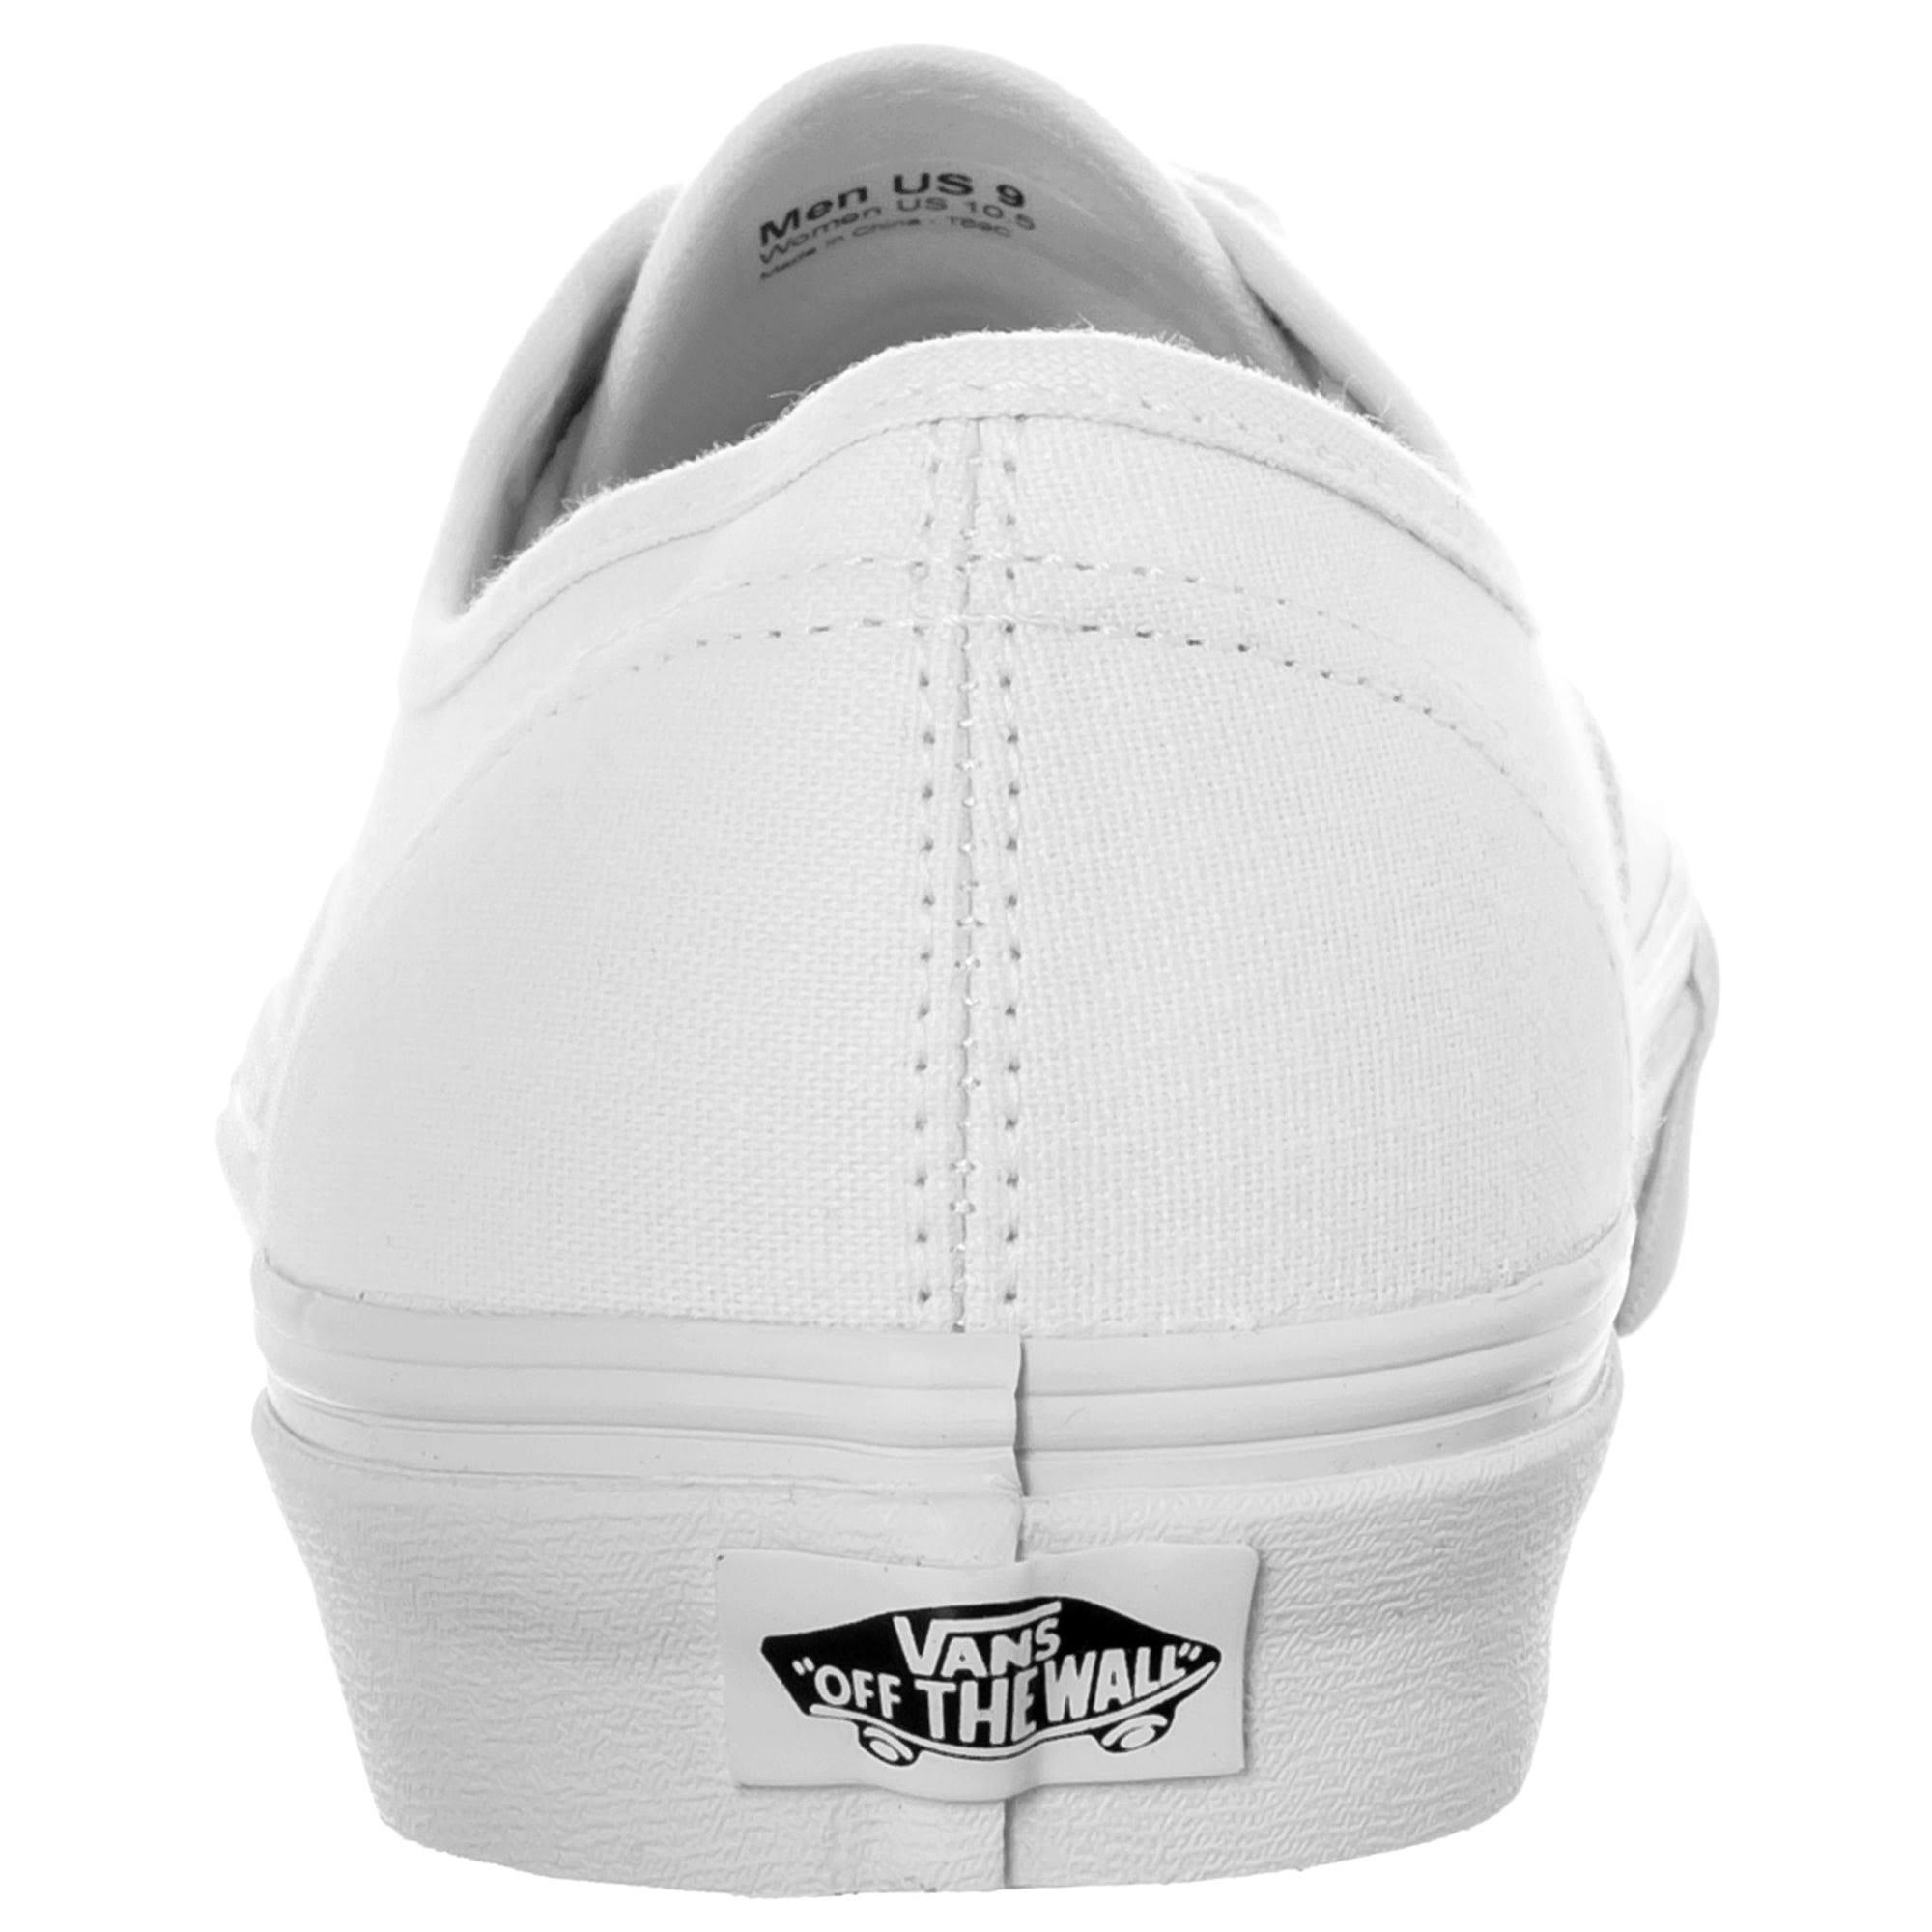 Wit White Vans AuthenticSneakers AuthenticSneakers Vans True yvmnP0N8Ow